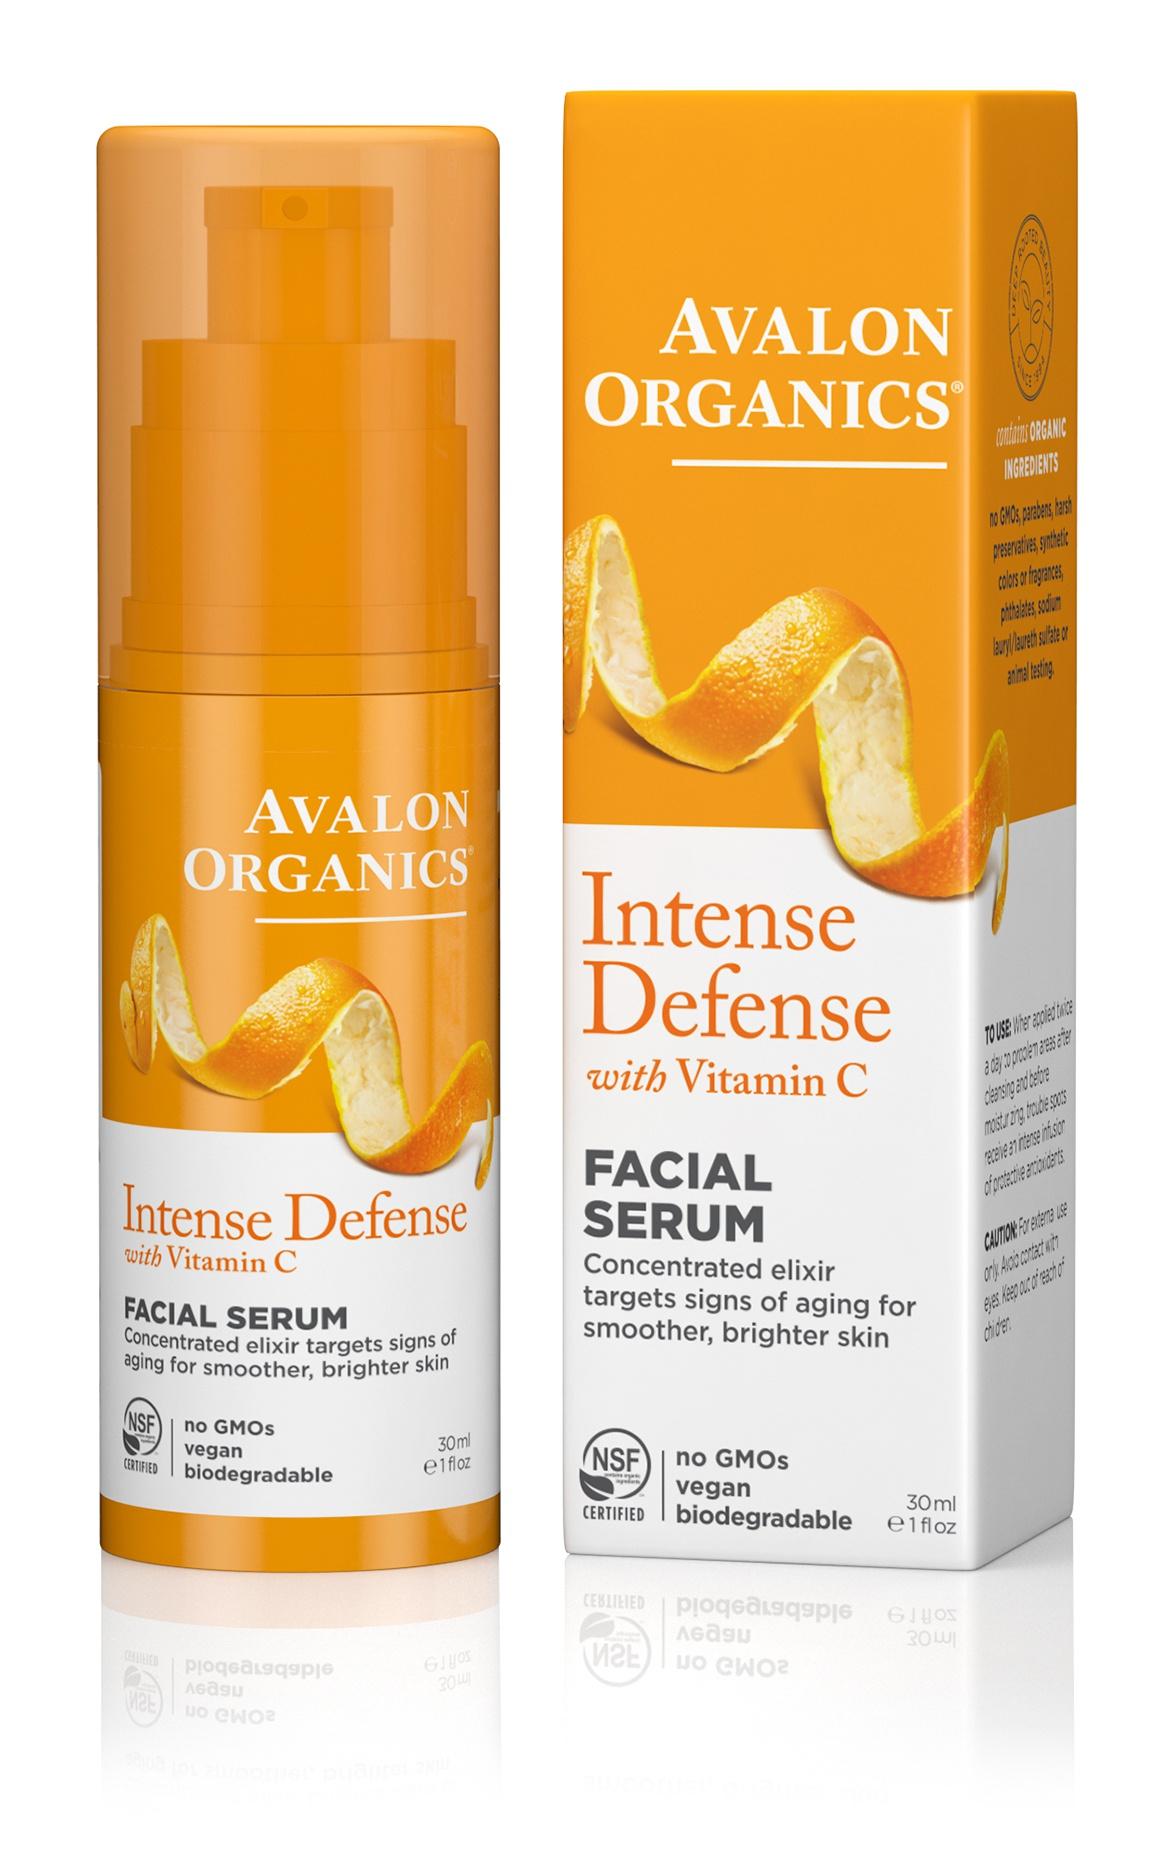 Avalon Organics Intense Defense Facial Serum With Vitamin C